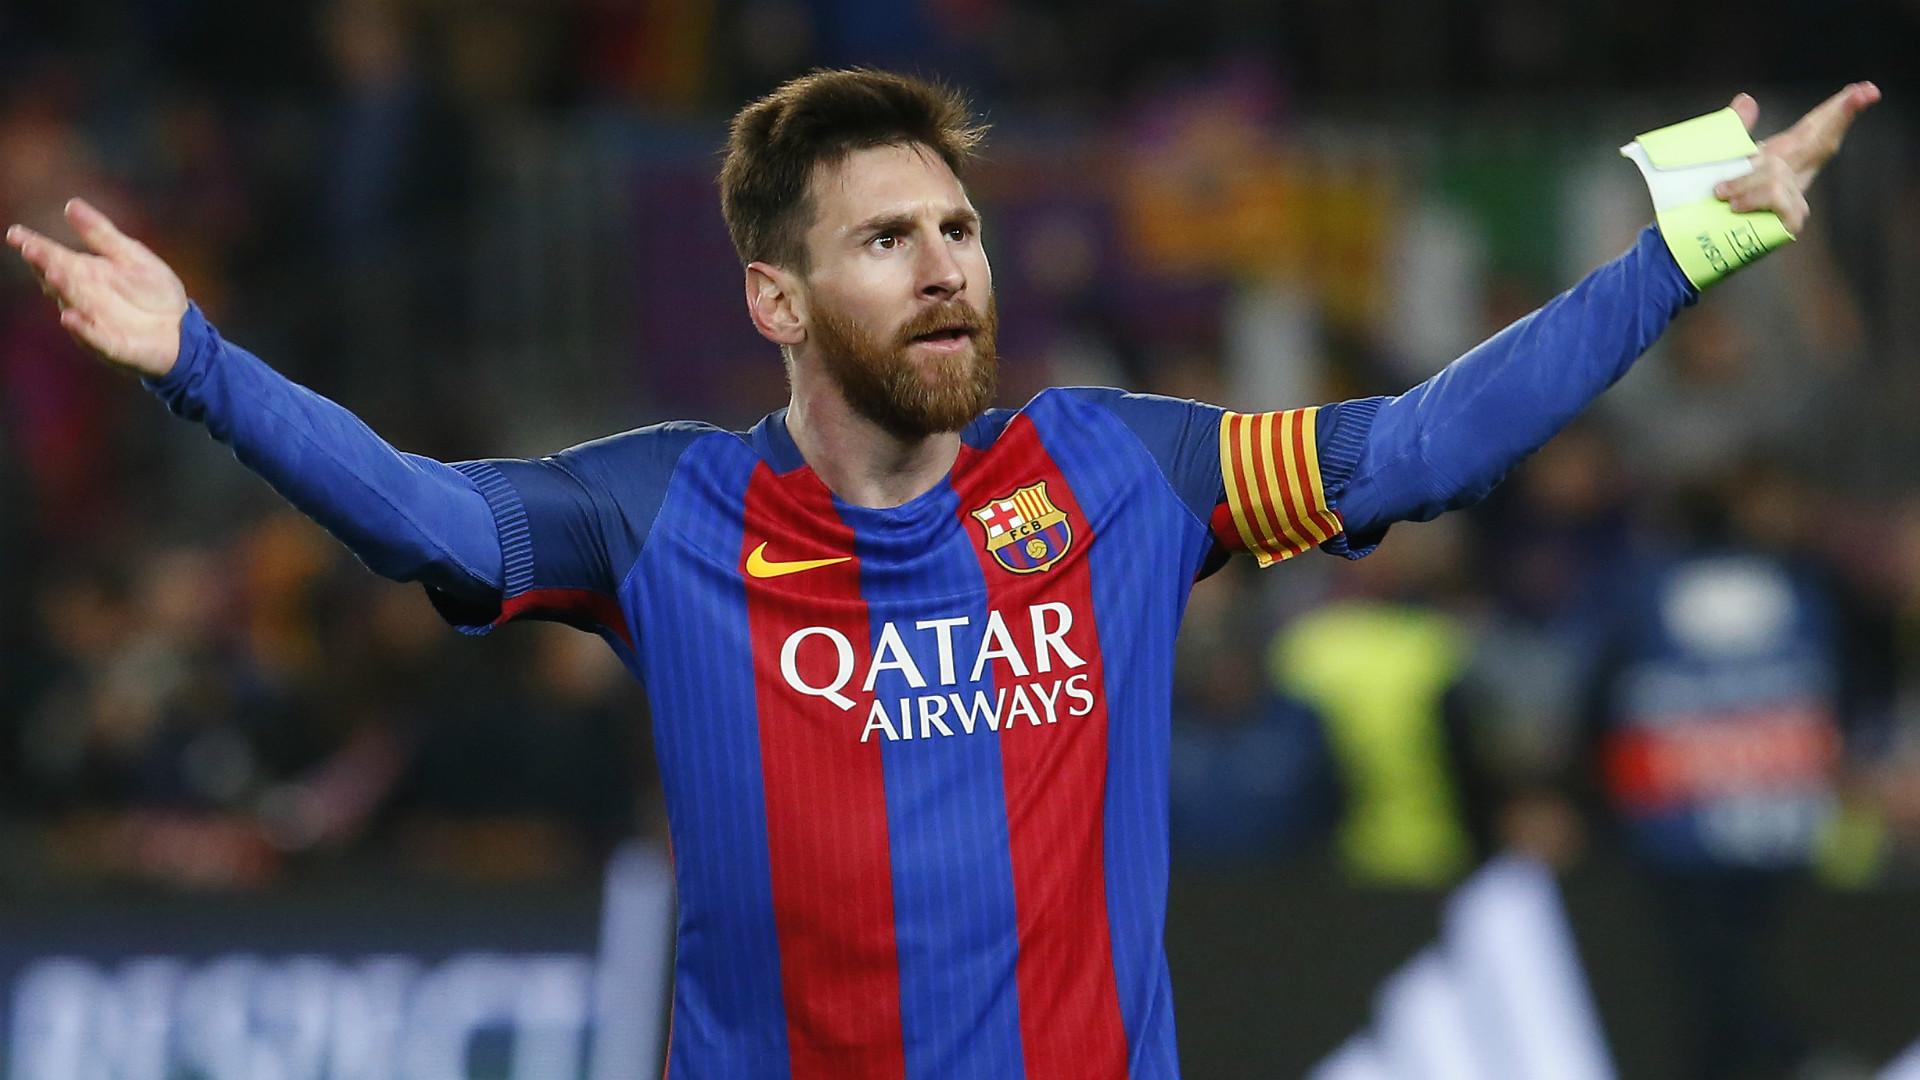 lionel-messi-barcelona-psg-uefa-champions-league-08032016_feltmf12bt0f18v9iprtnl463